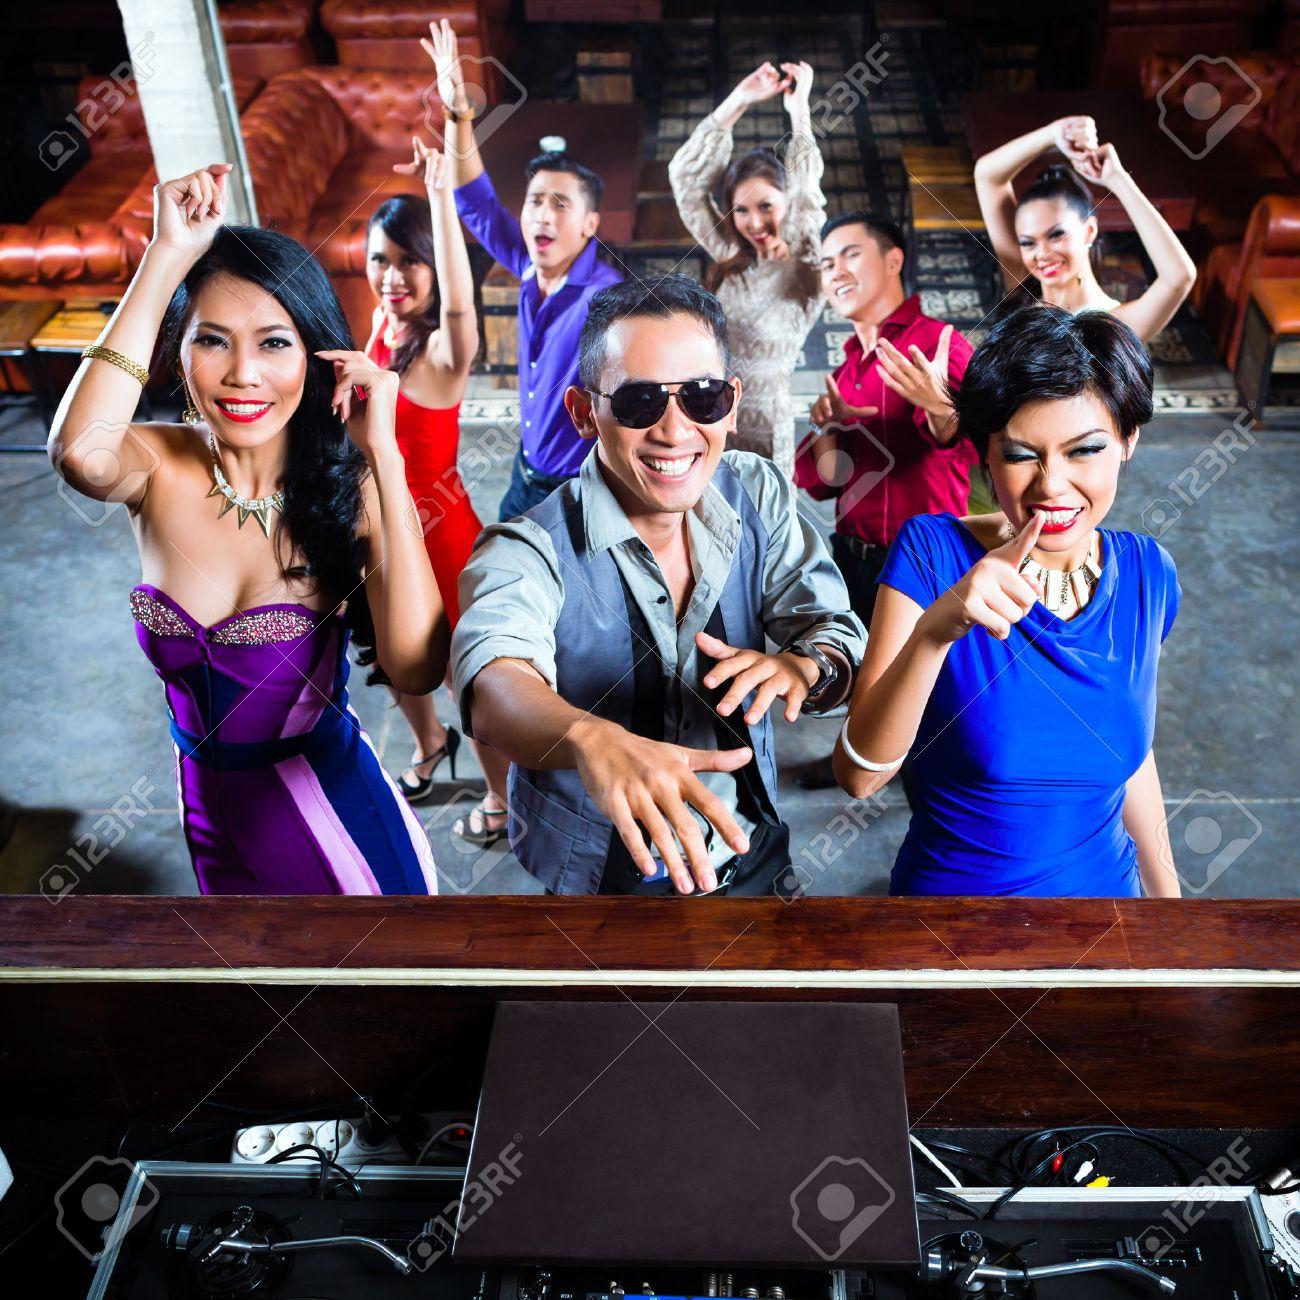 Asian Club Pics